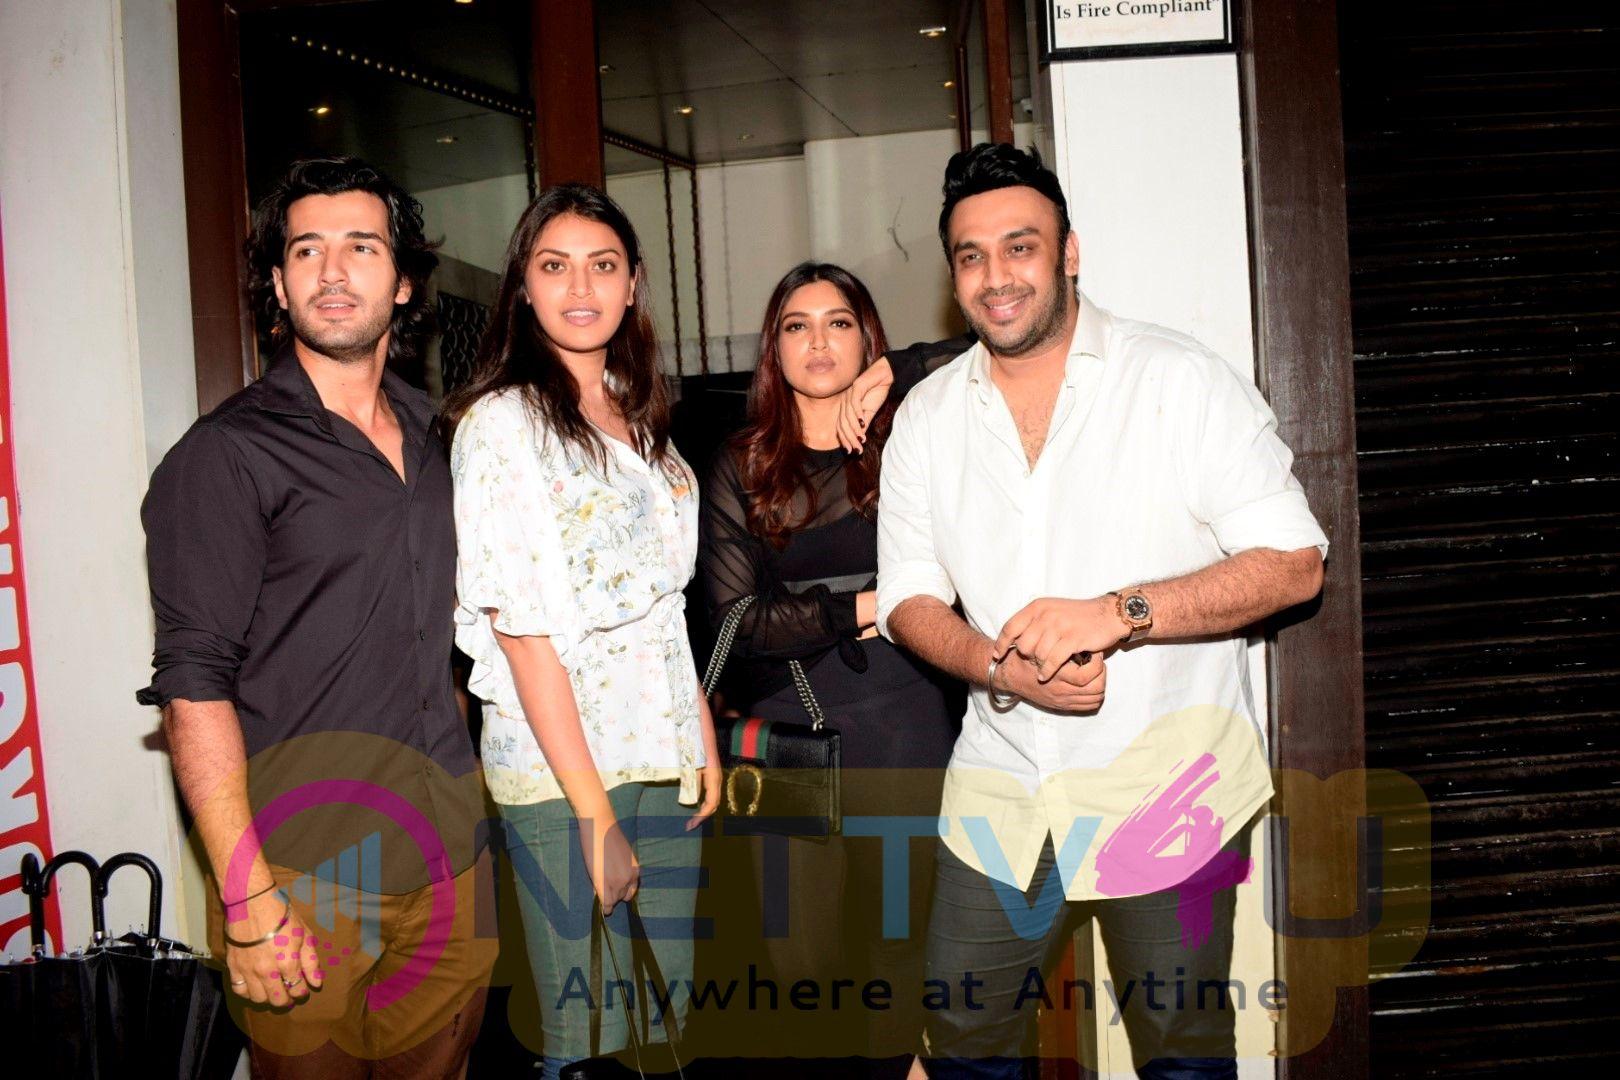 Bhumi Pednekar And  Vaani Kapoor Spotted At Bastian Restaurant In Bandra Best Images